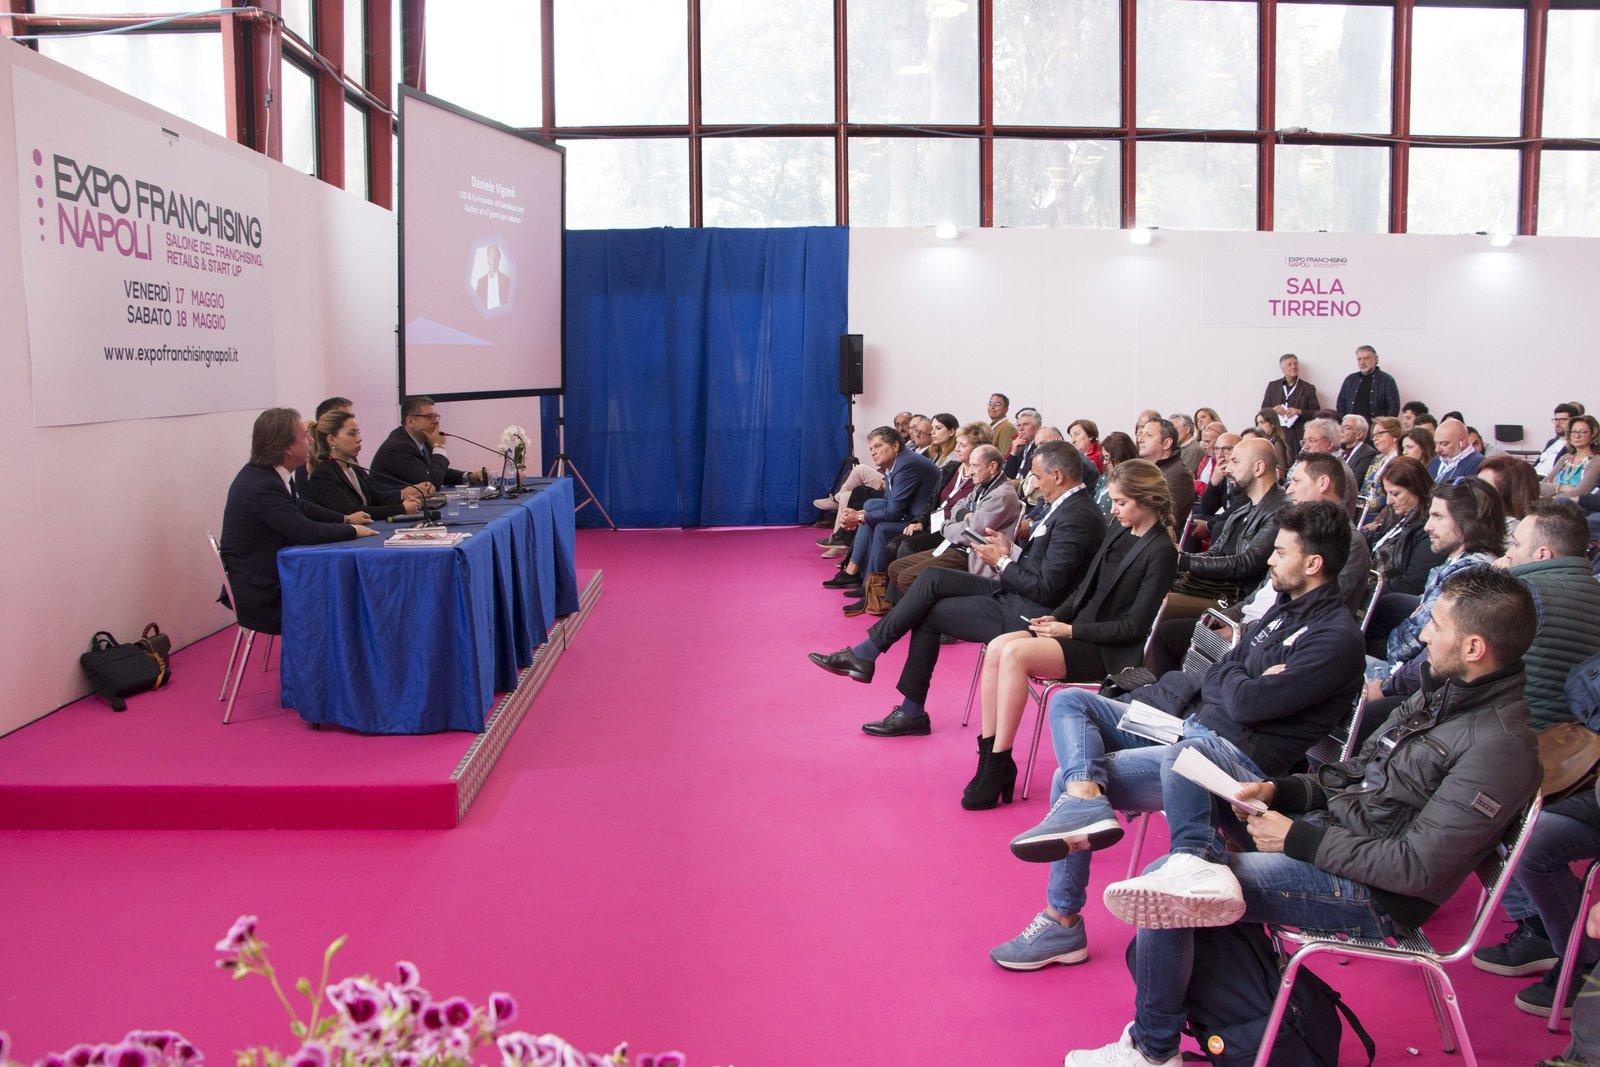 Expo Franchising Napoli